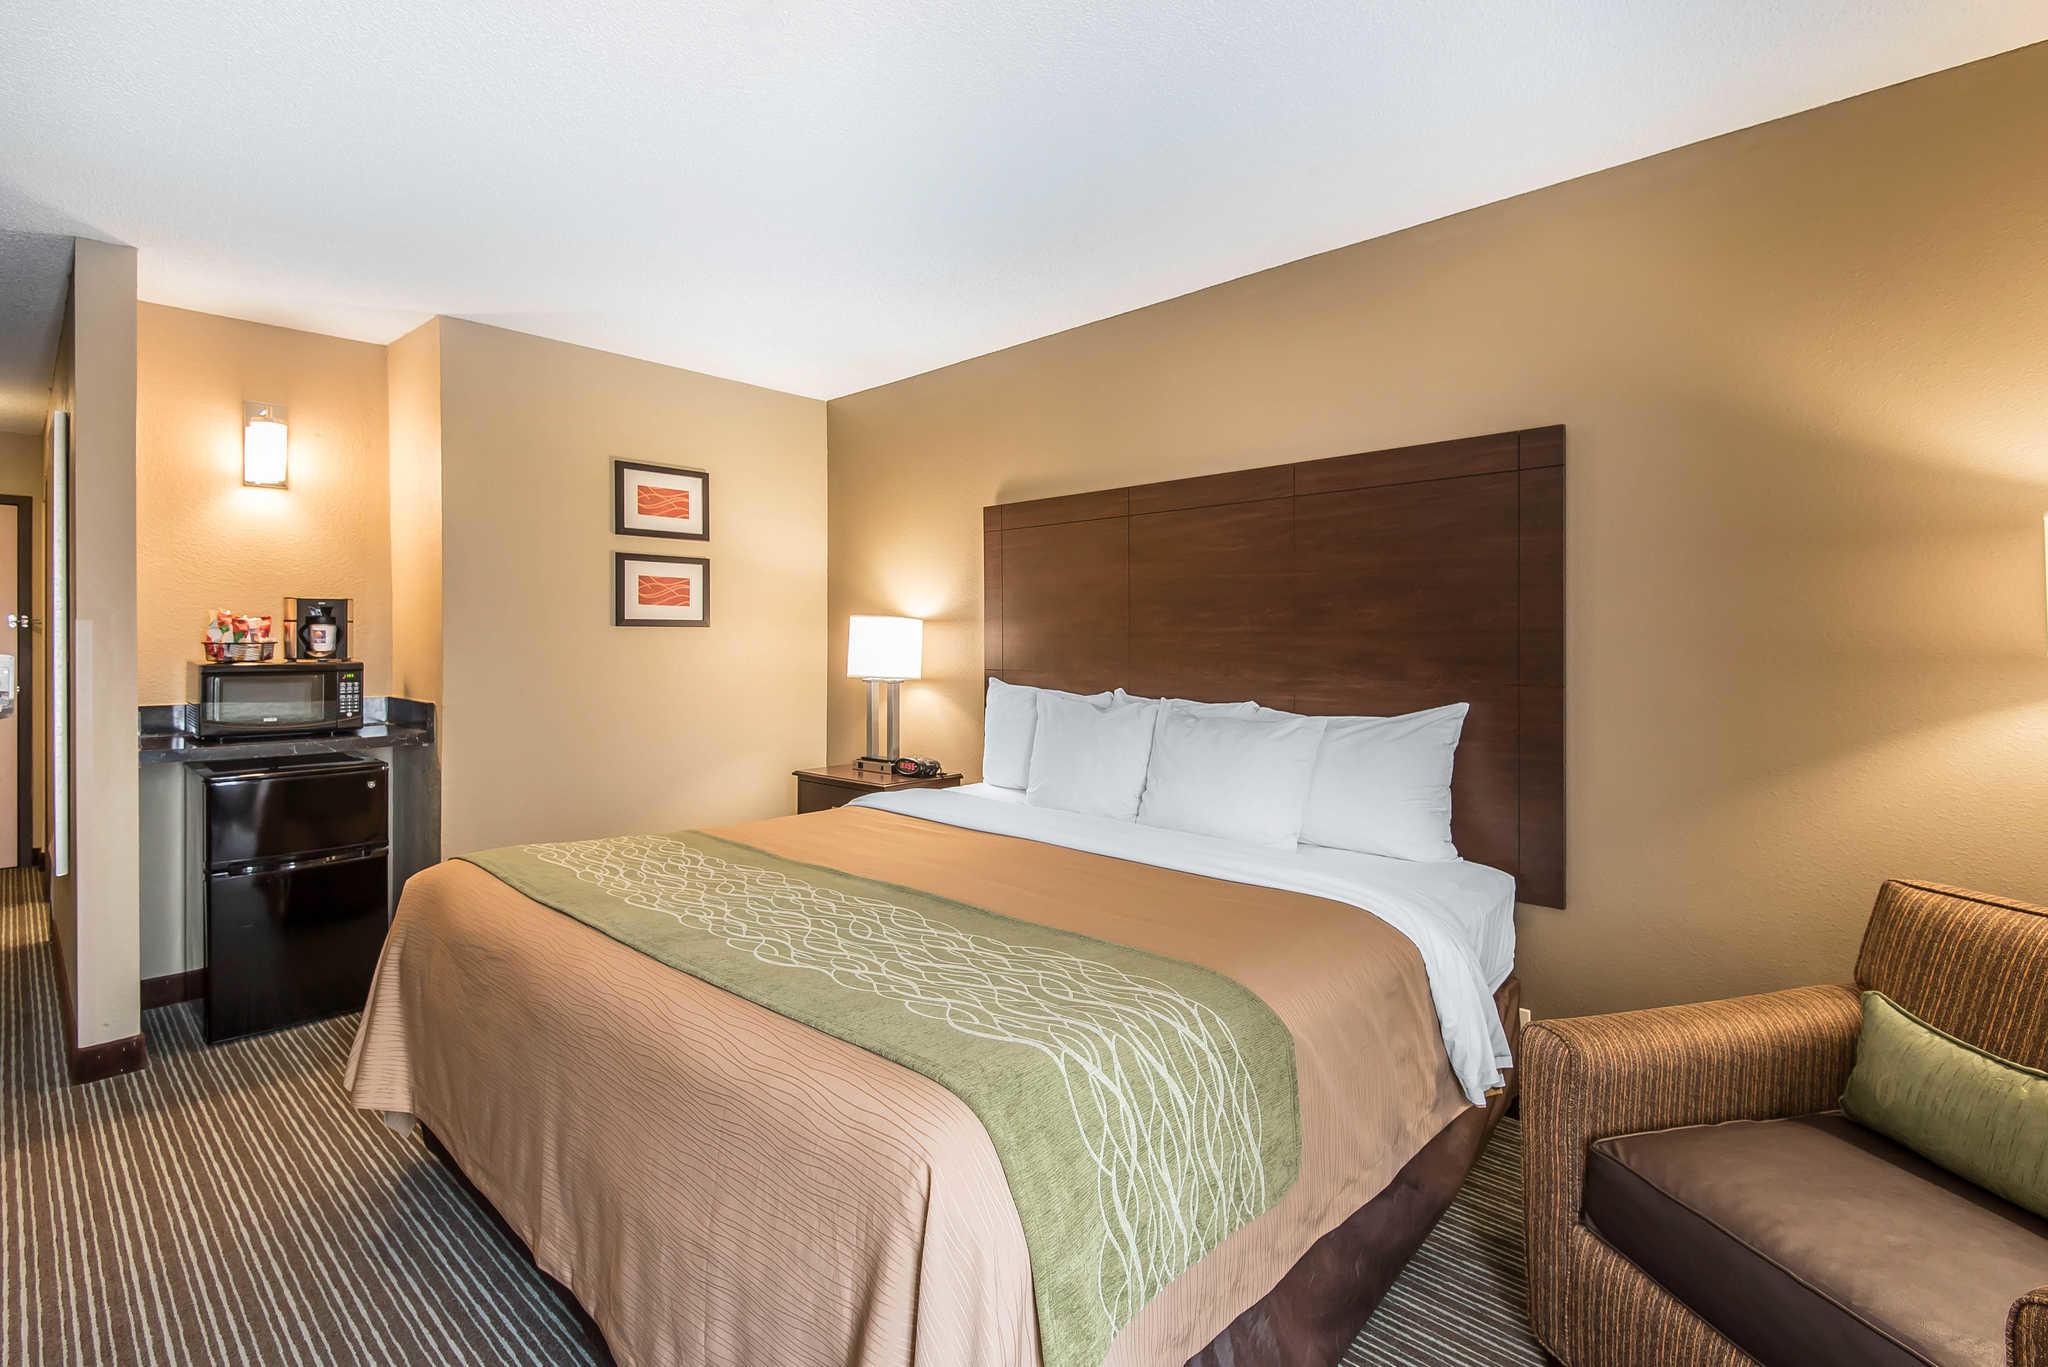 Comfort Inn & Suites Kansas City - Northeast image 6